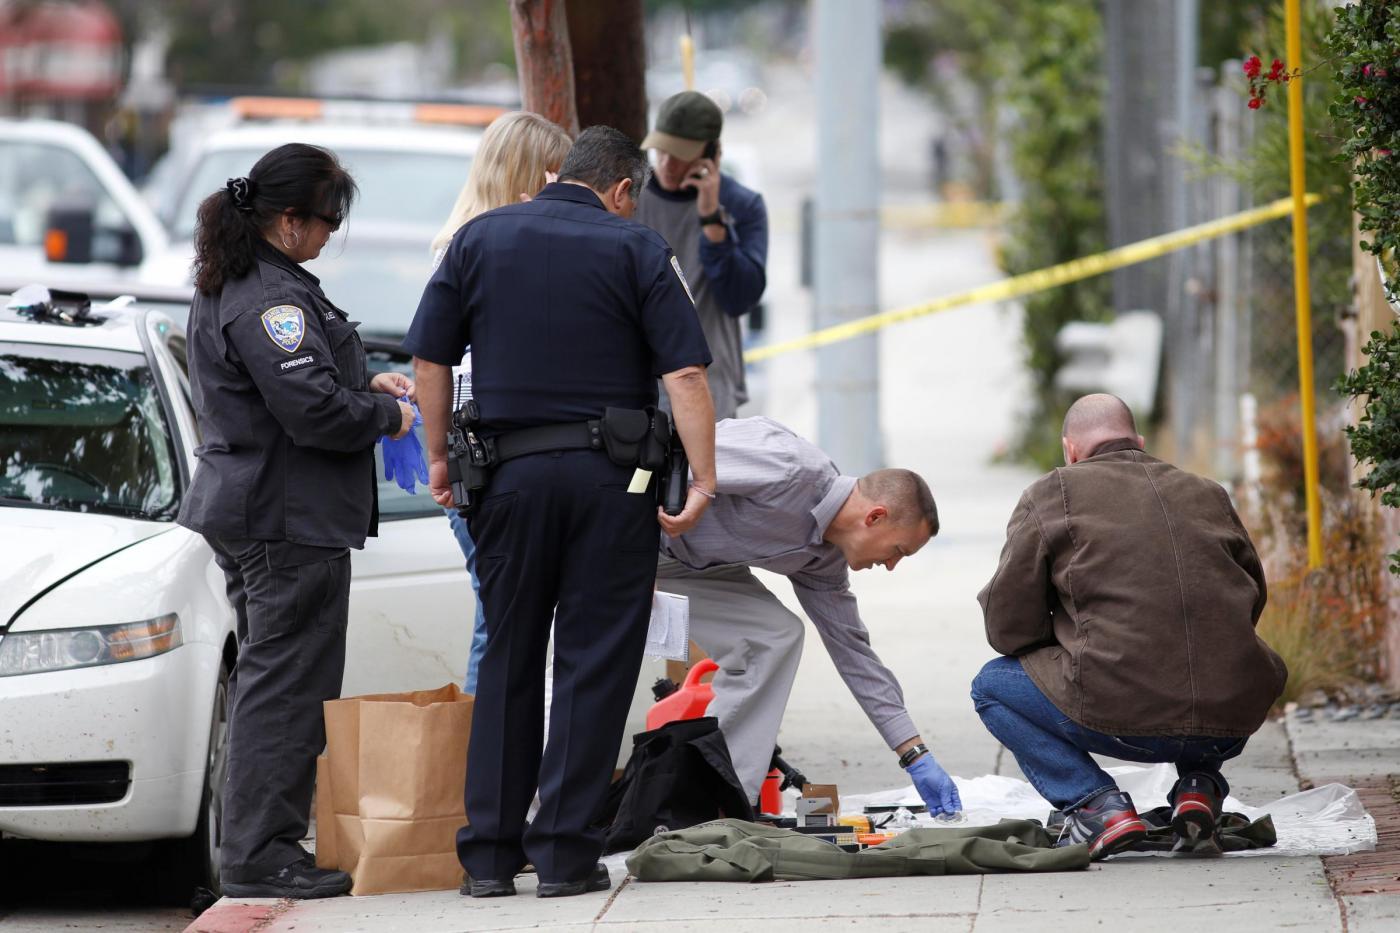 Usa, arrestato con armi ed esplosivo, andava al Los Angeles Pride